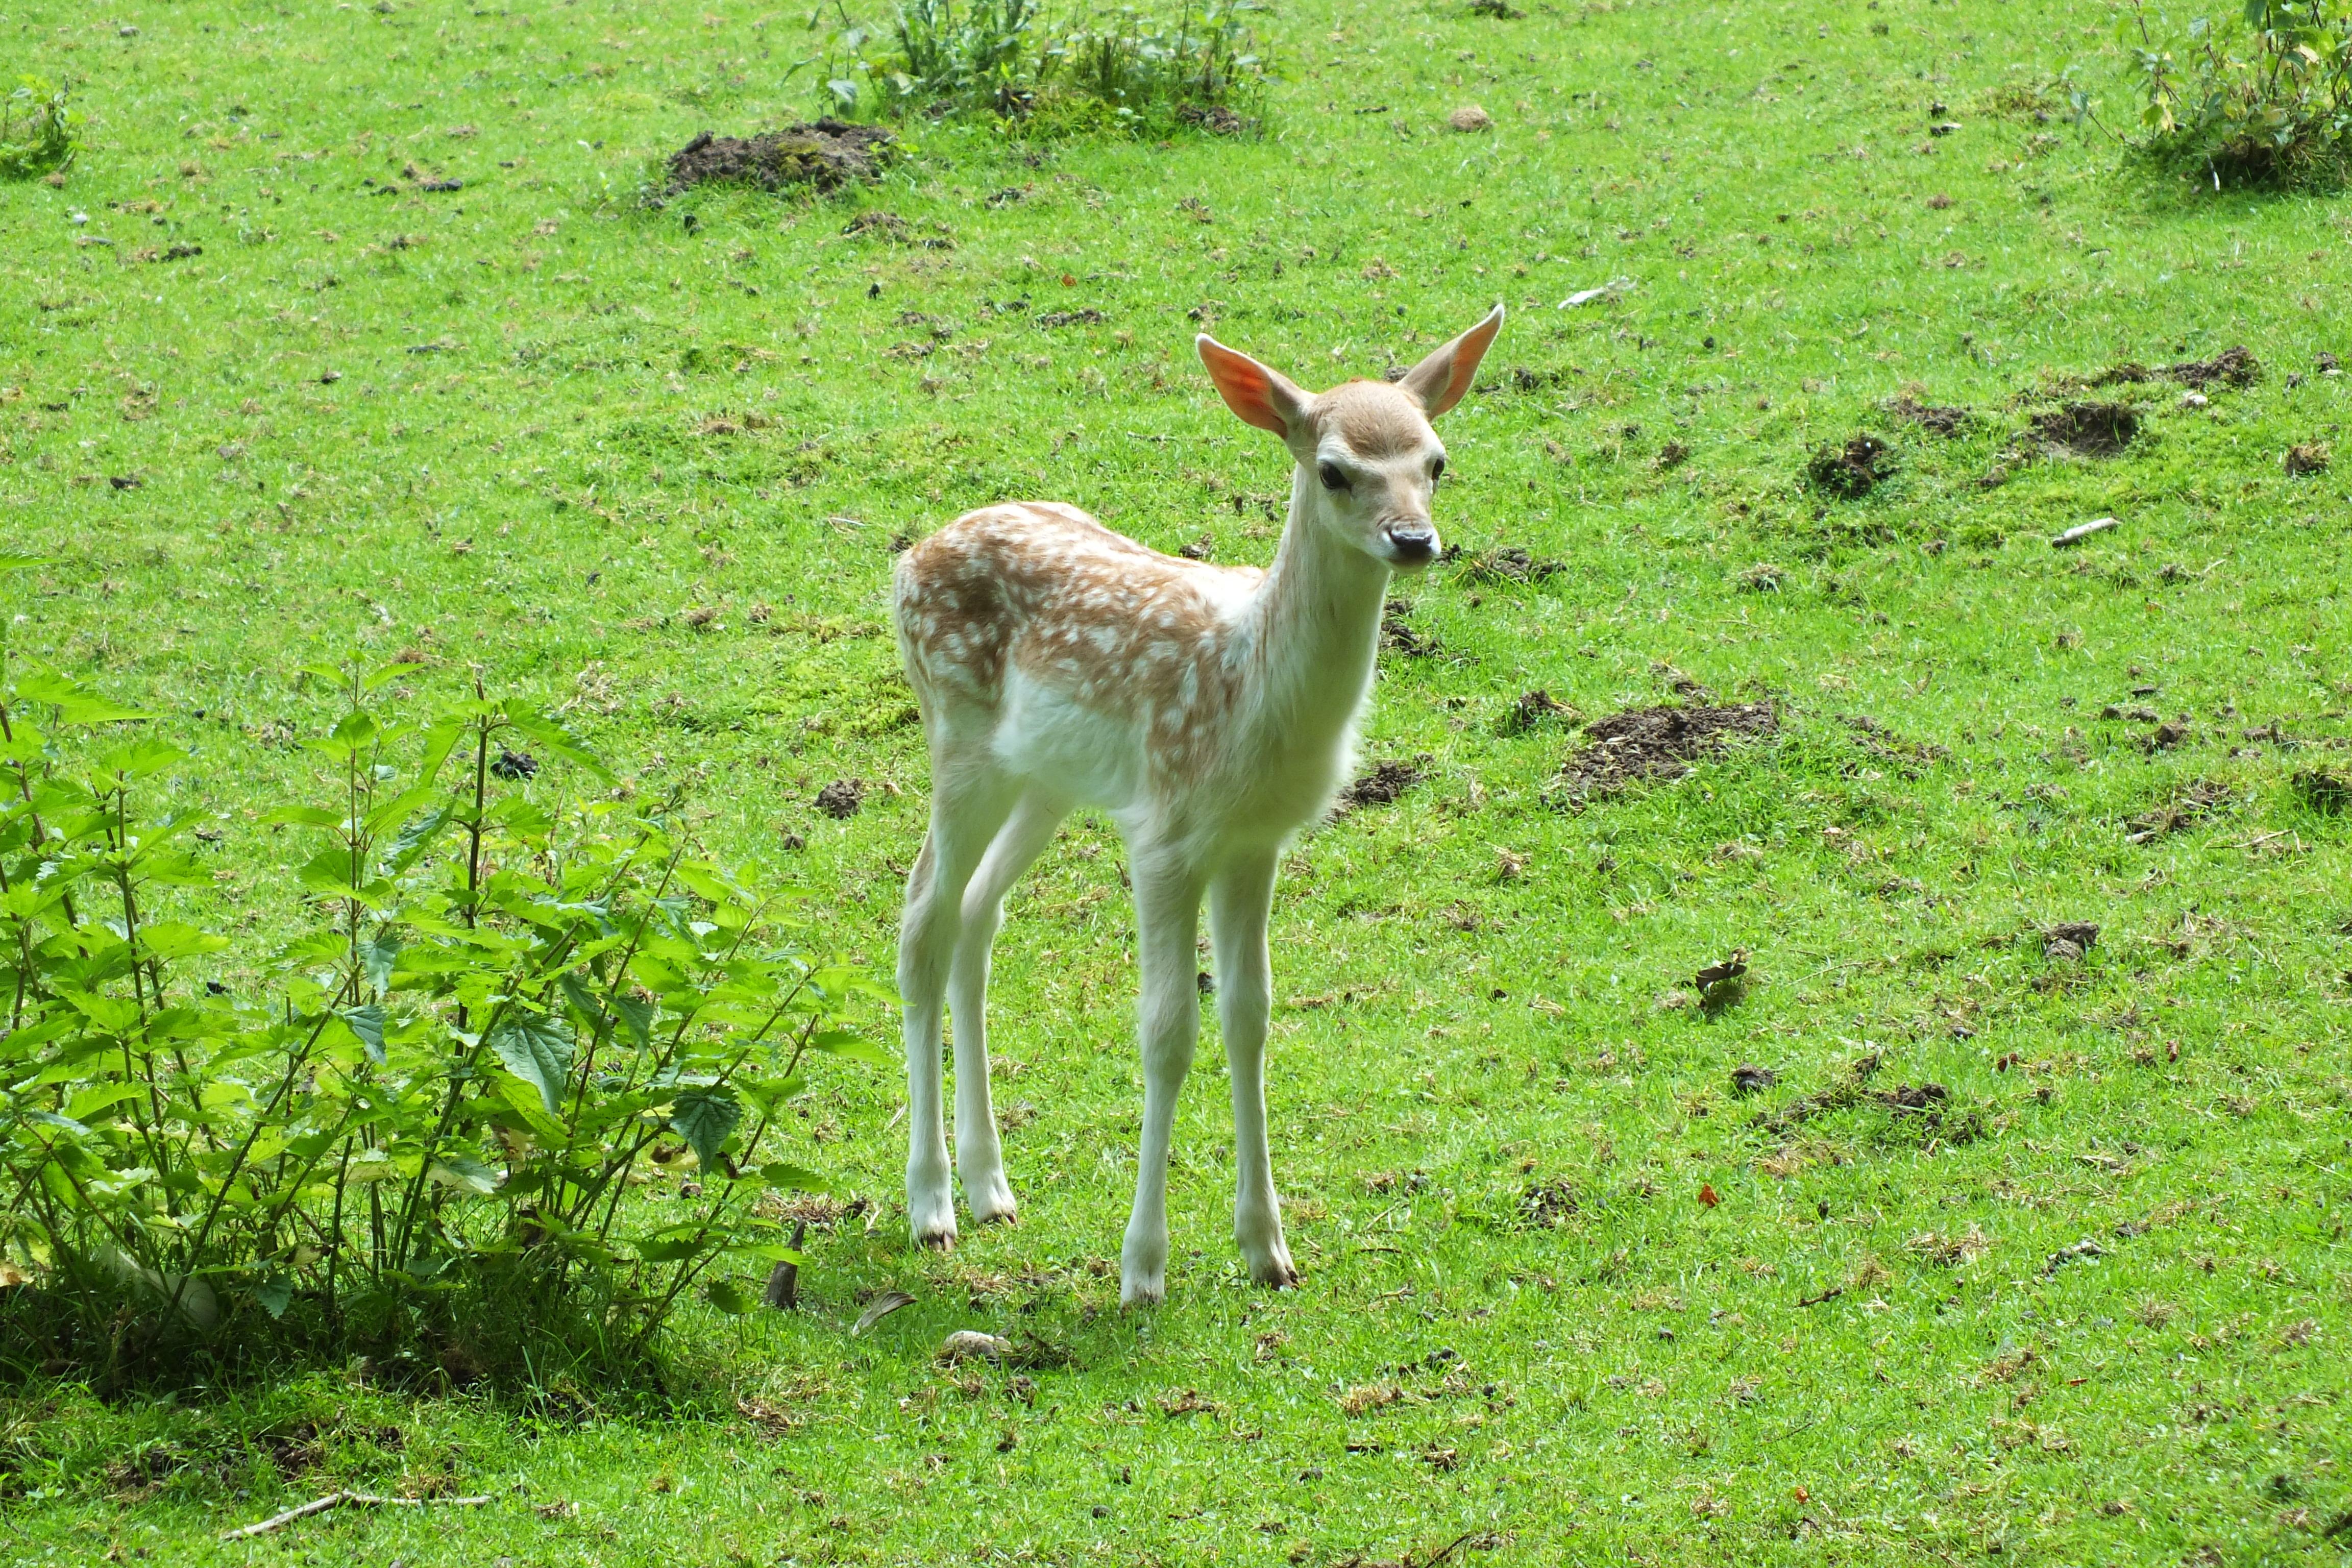 Baby deer, Animal, Deer, Small, Wild, HQ Photo